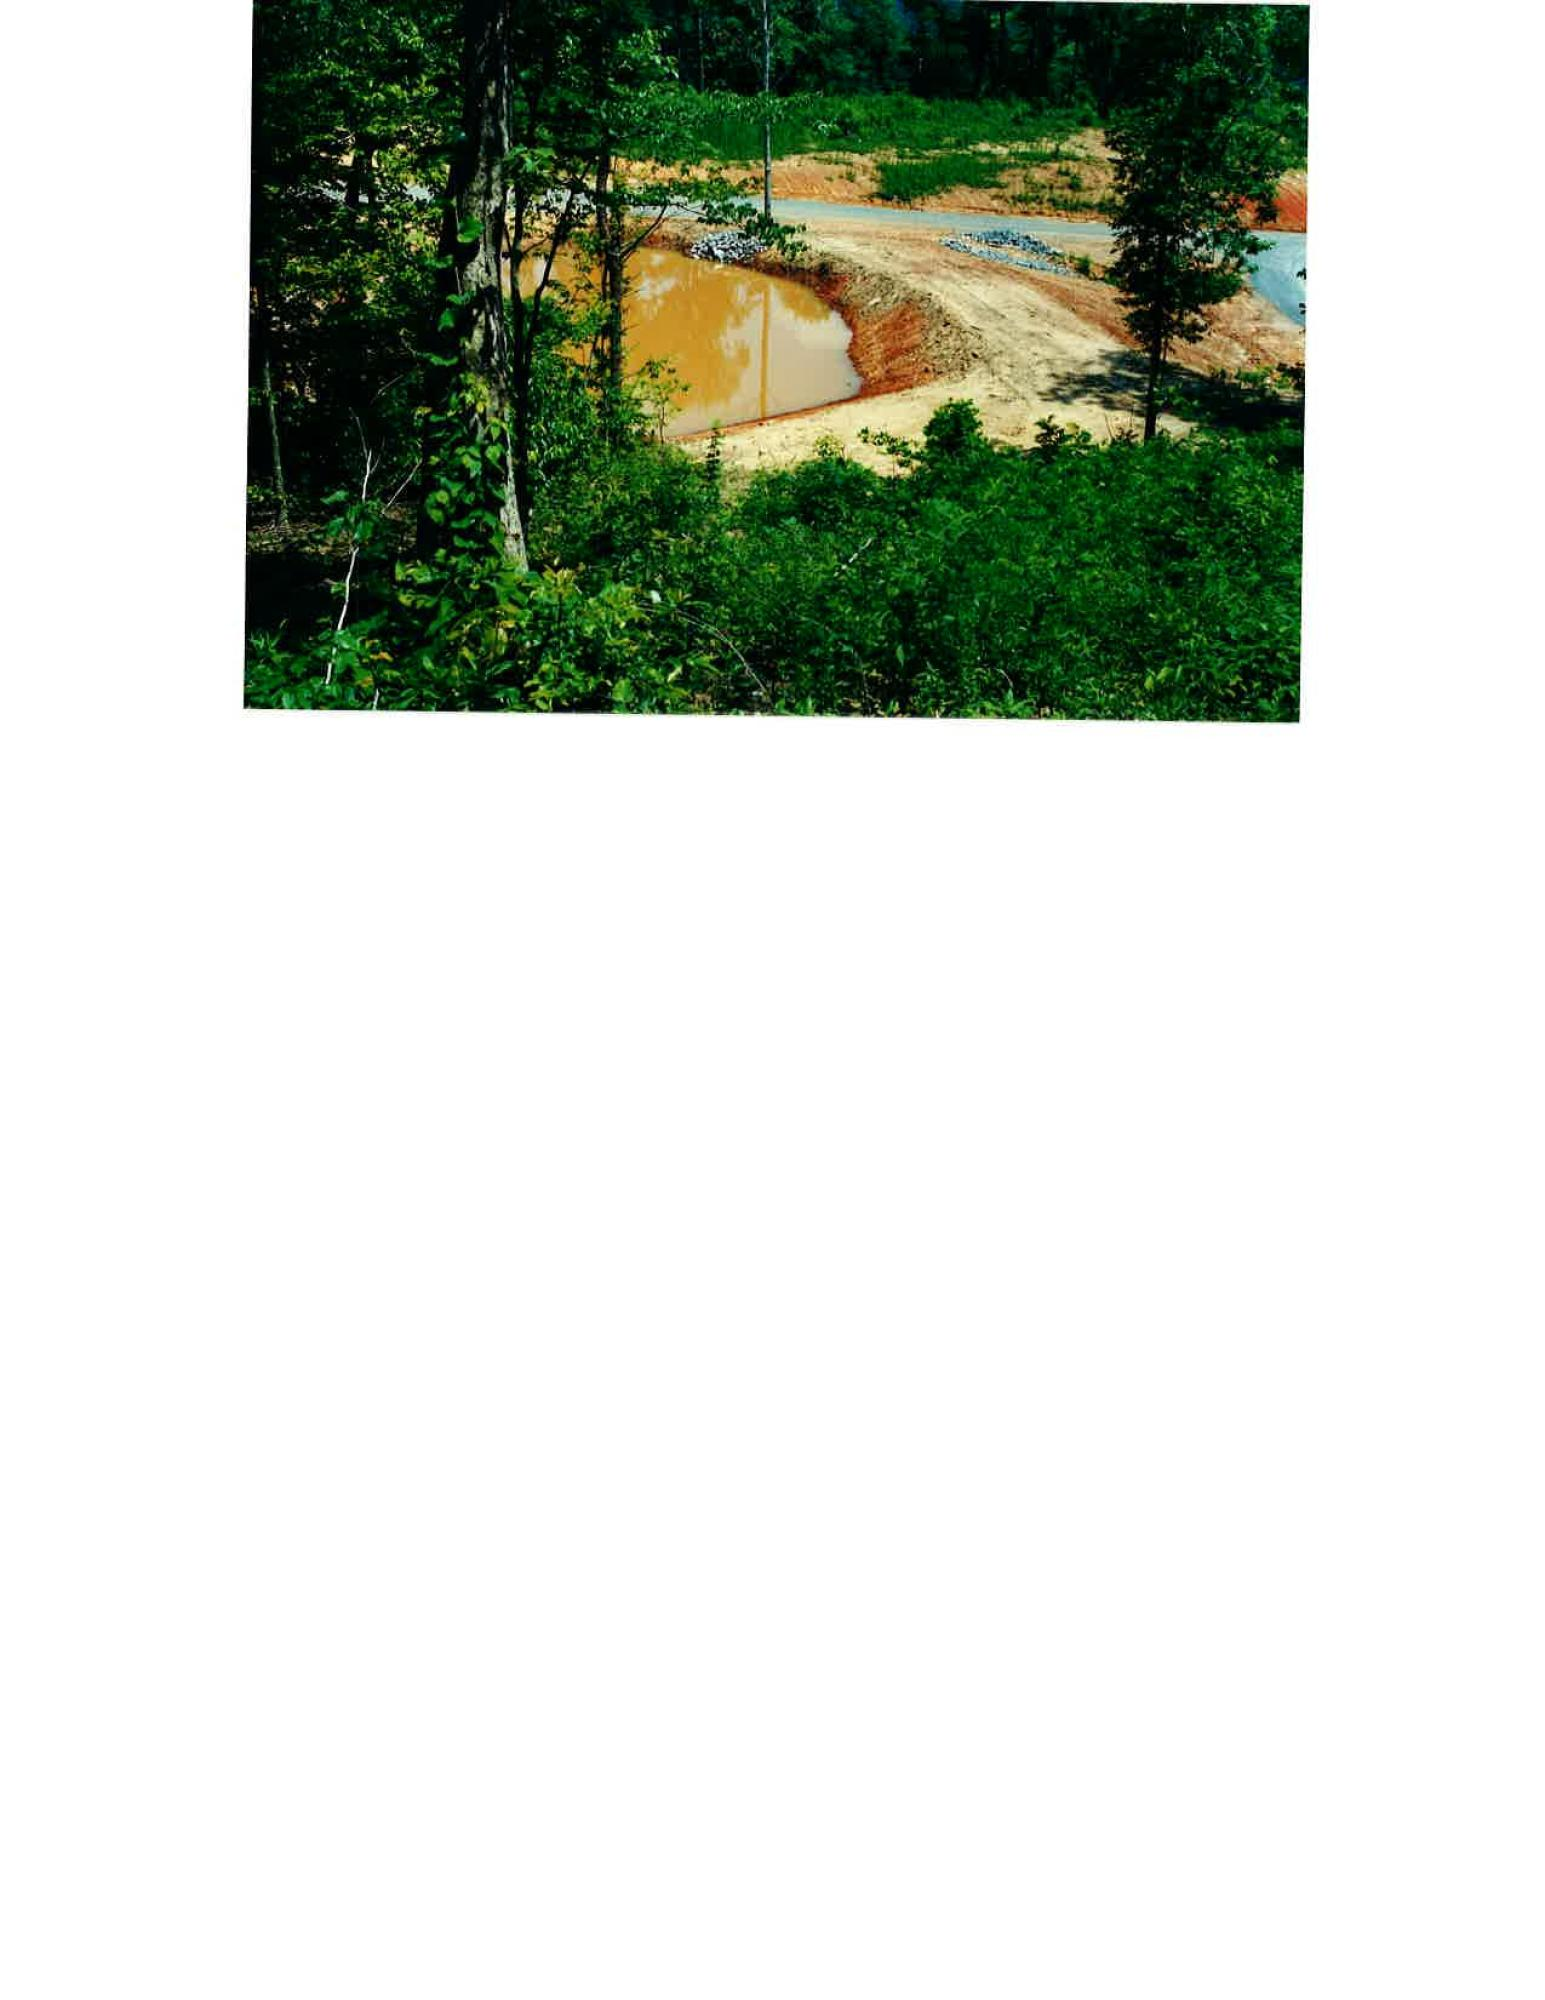 Lot 116 Chimney Rock Rd: